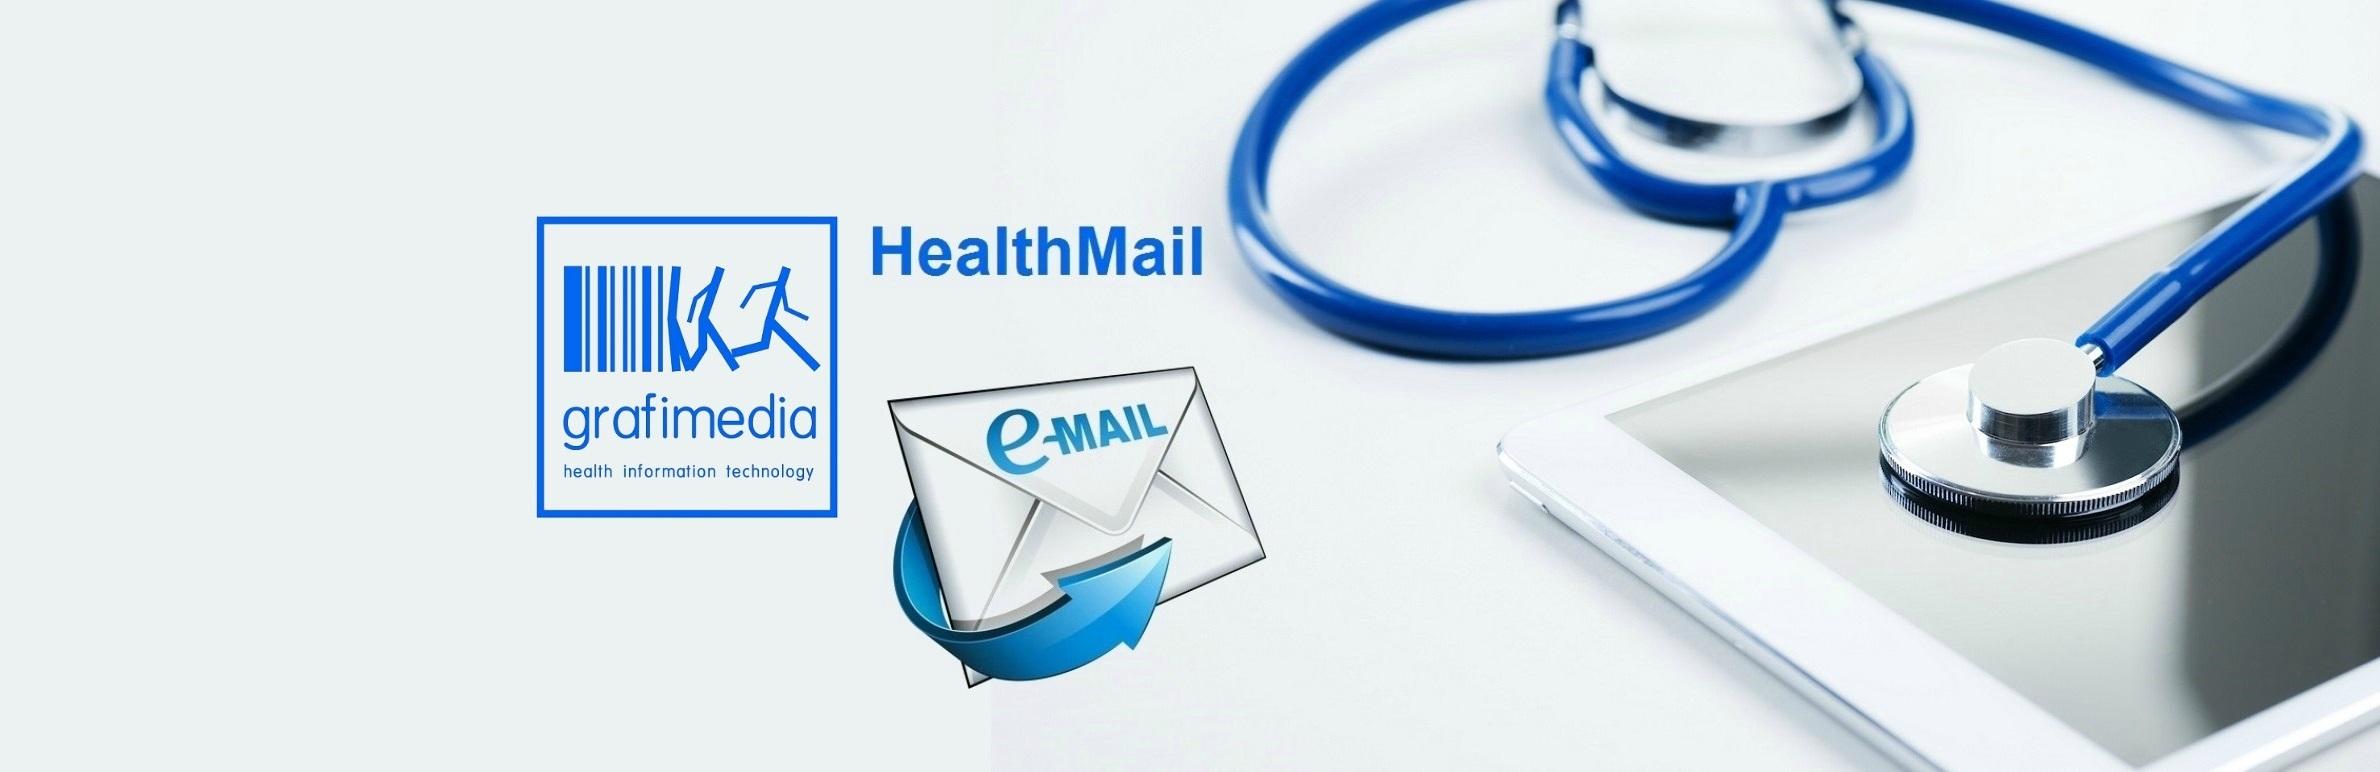 Grafimedia HealthMail App